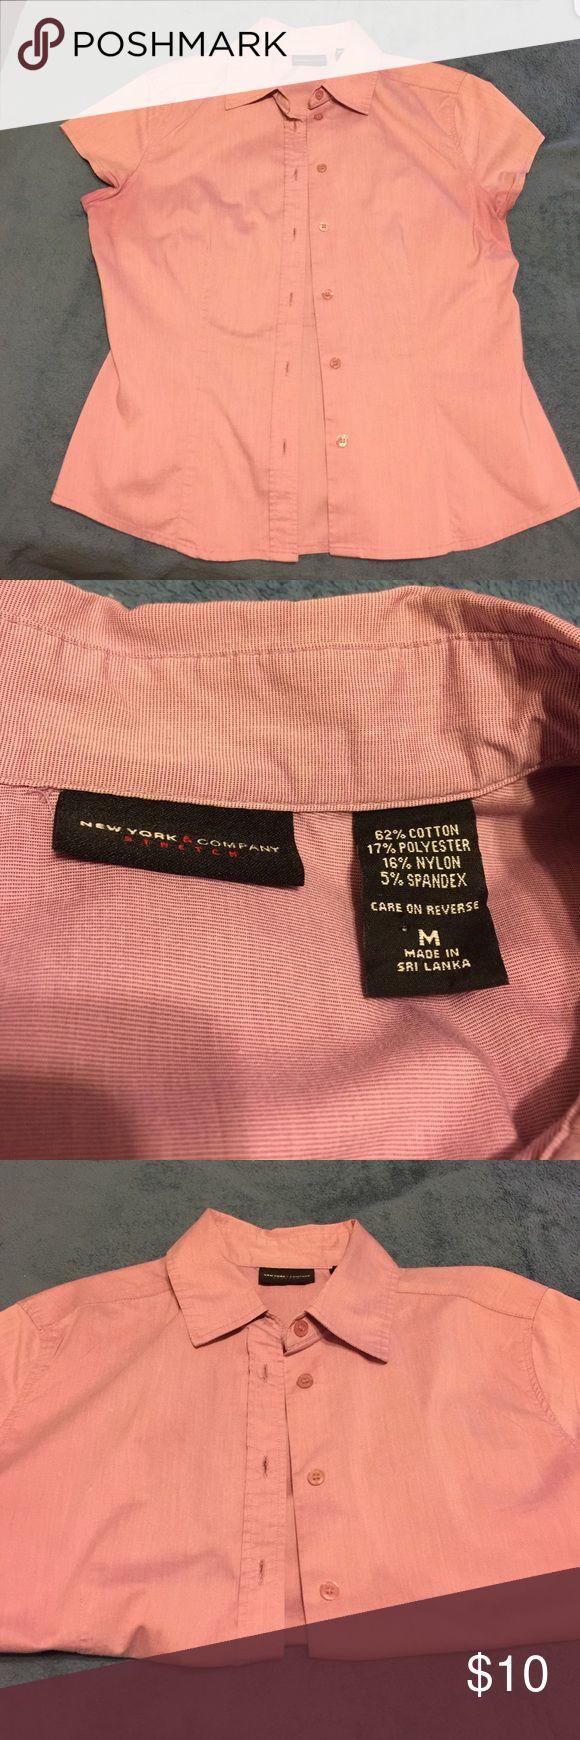 New York & company short sleeve dress shirt New York & Company short sleeve stretch dress shirt. Size Medium. New York & Company Tops Button Down Shirts